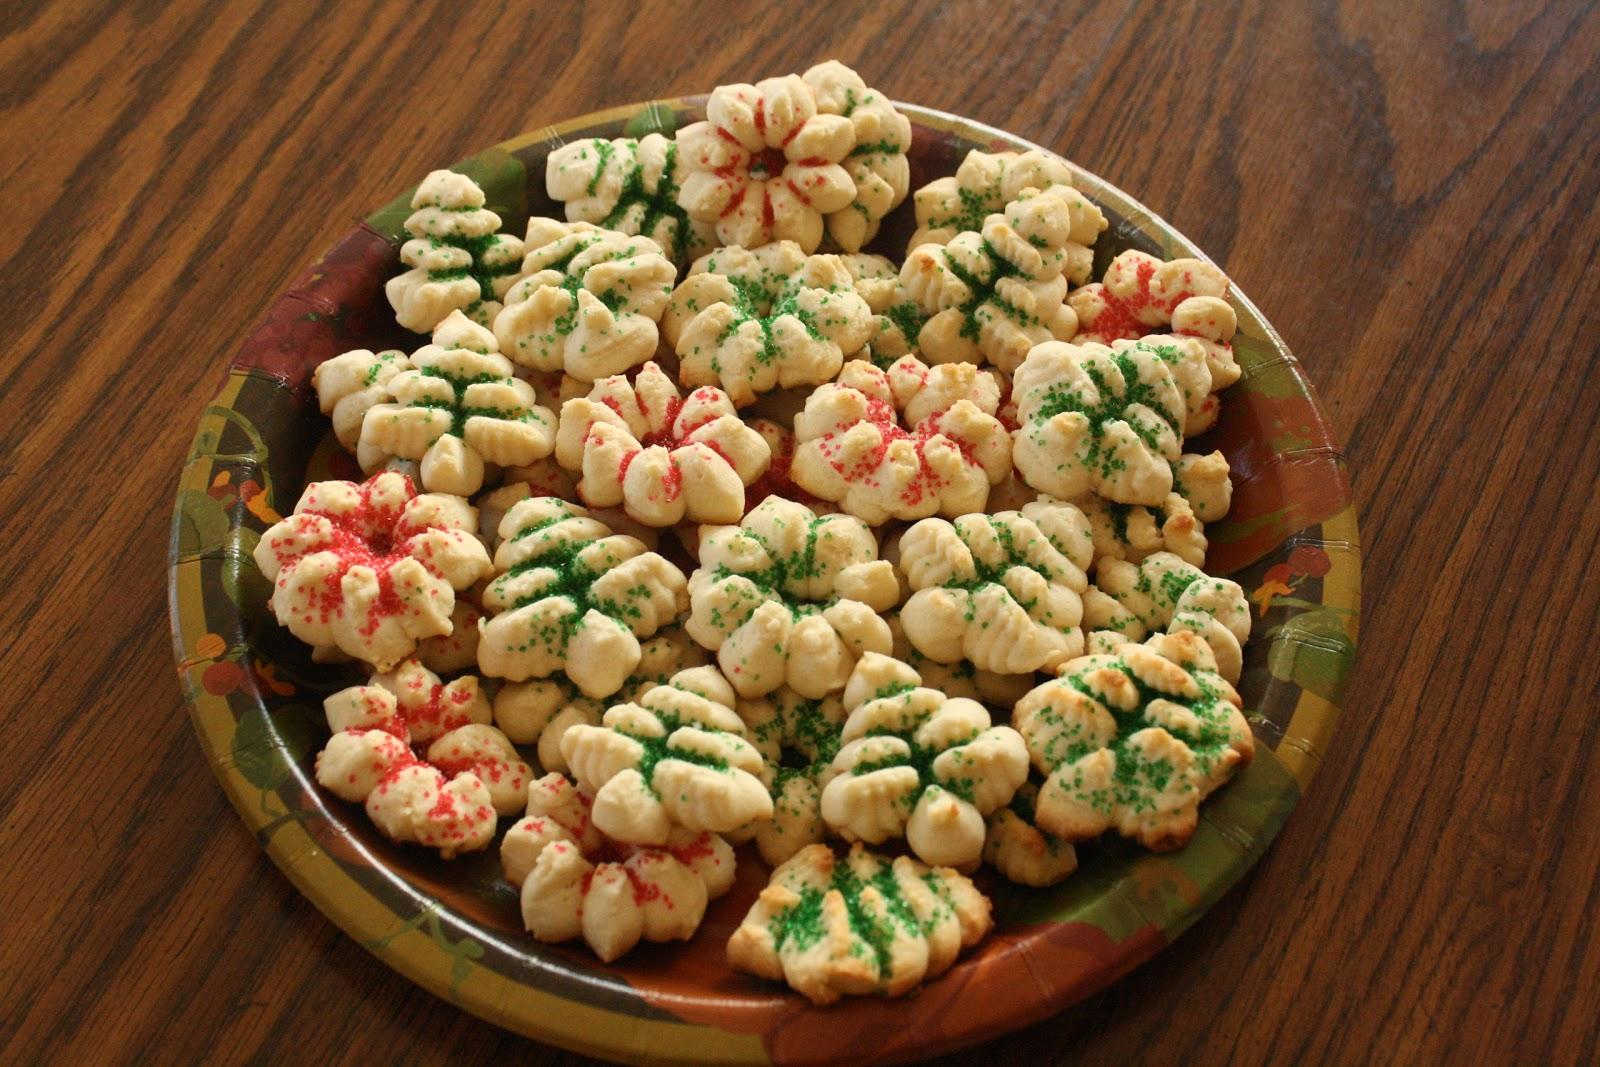 we love cookies swedish spritz norwegian krumkake the secret mcd family christmas cookie cutouts its no wonder im always dieting come january